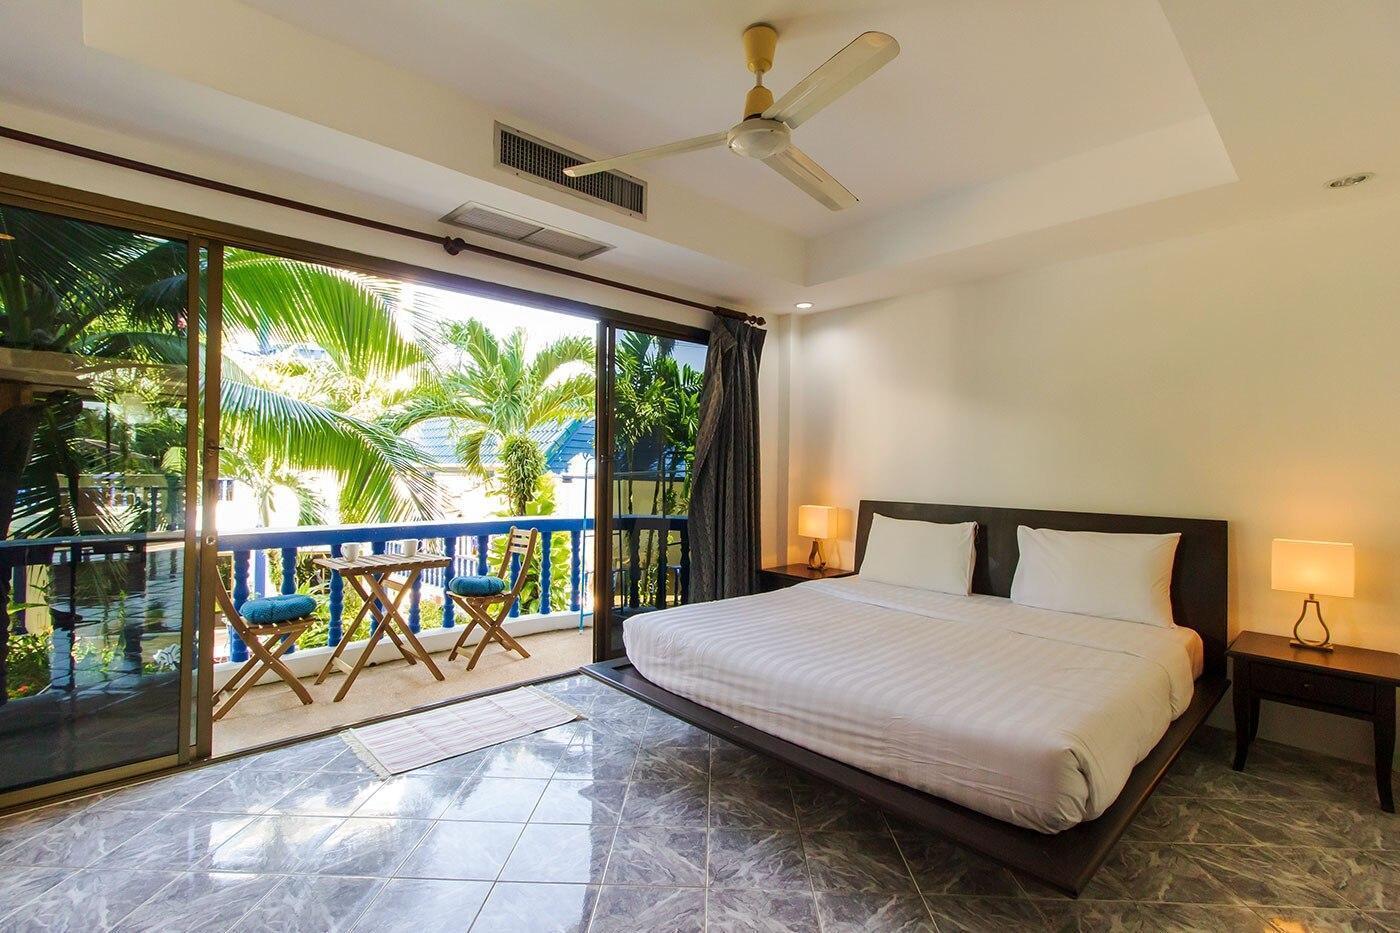 Tranquil 1 Bed Apartment. Walk to Kamala Beach. อพาร์ตเมนต์ 1 ห้องนอน 1 ห้องน้ำส่วนตัว ขนาด 60 ตร.ม. – กมลา